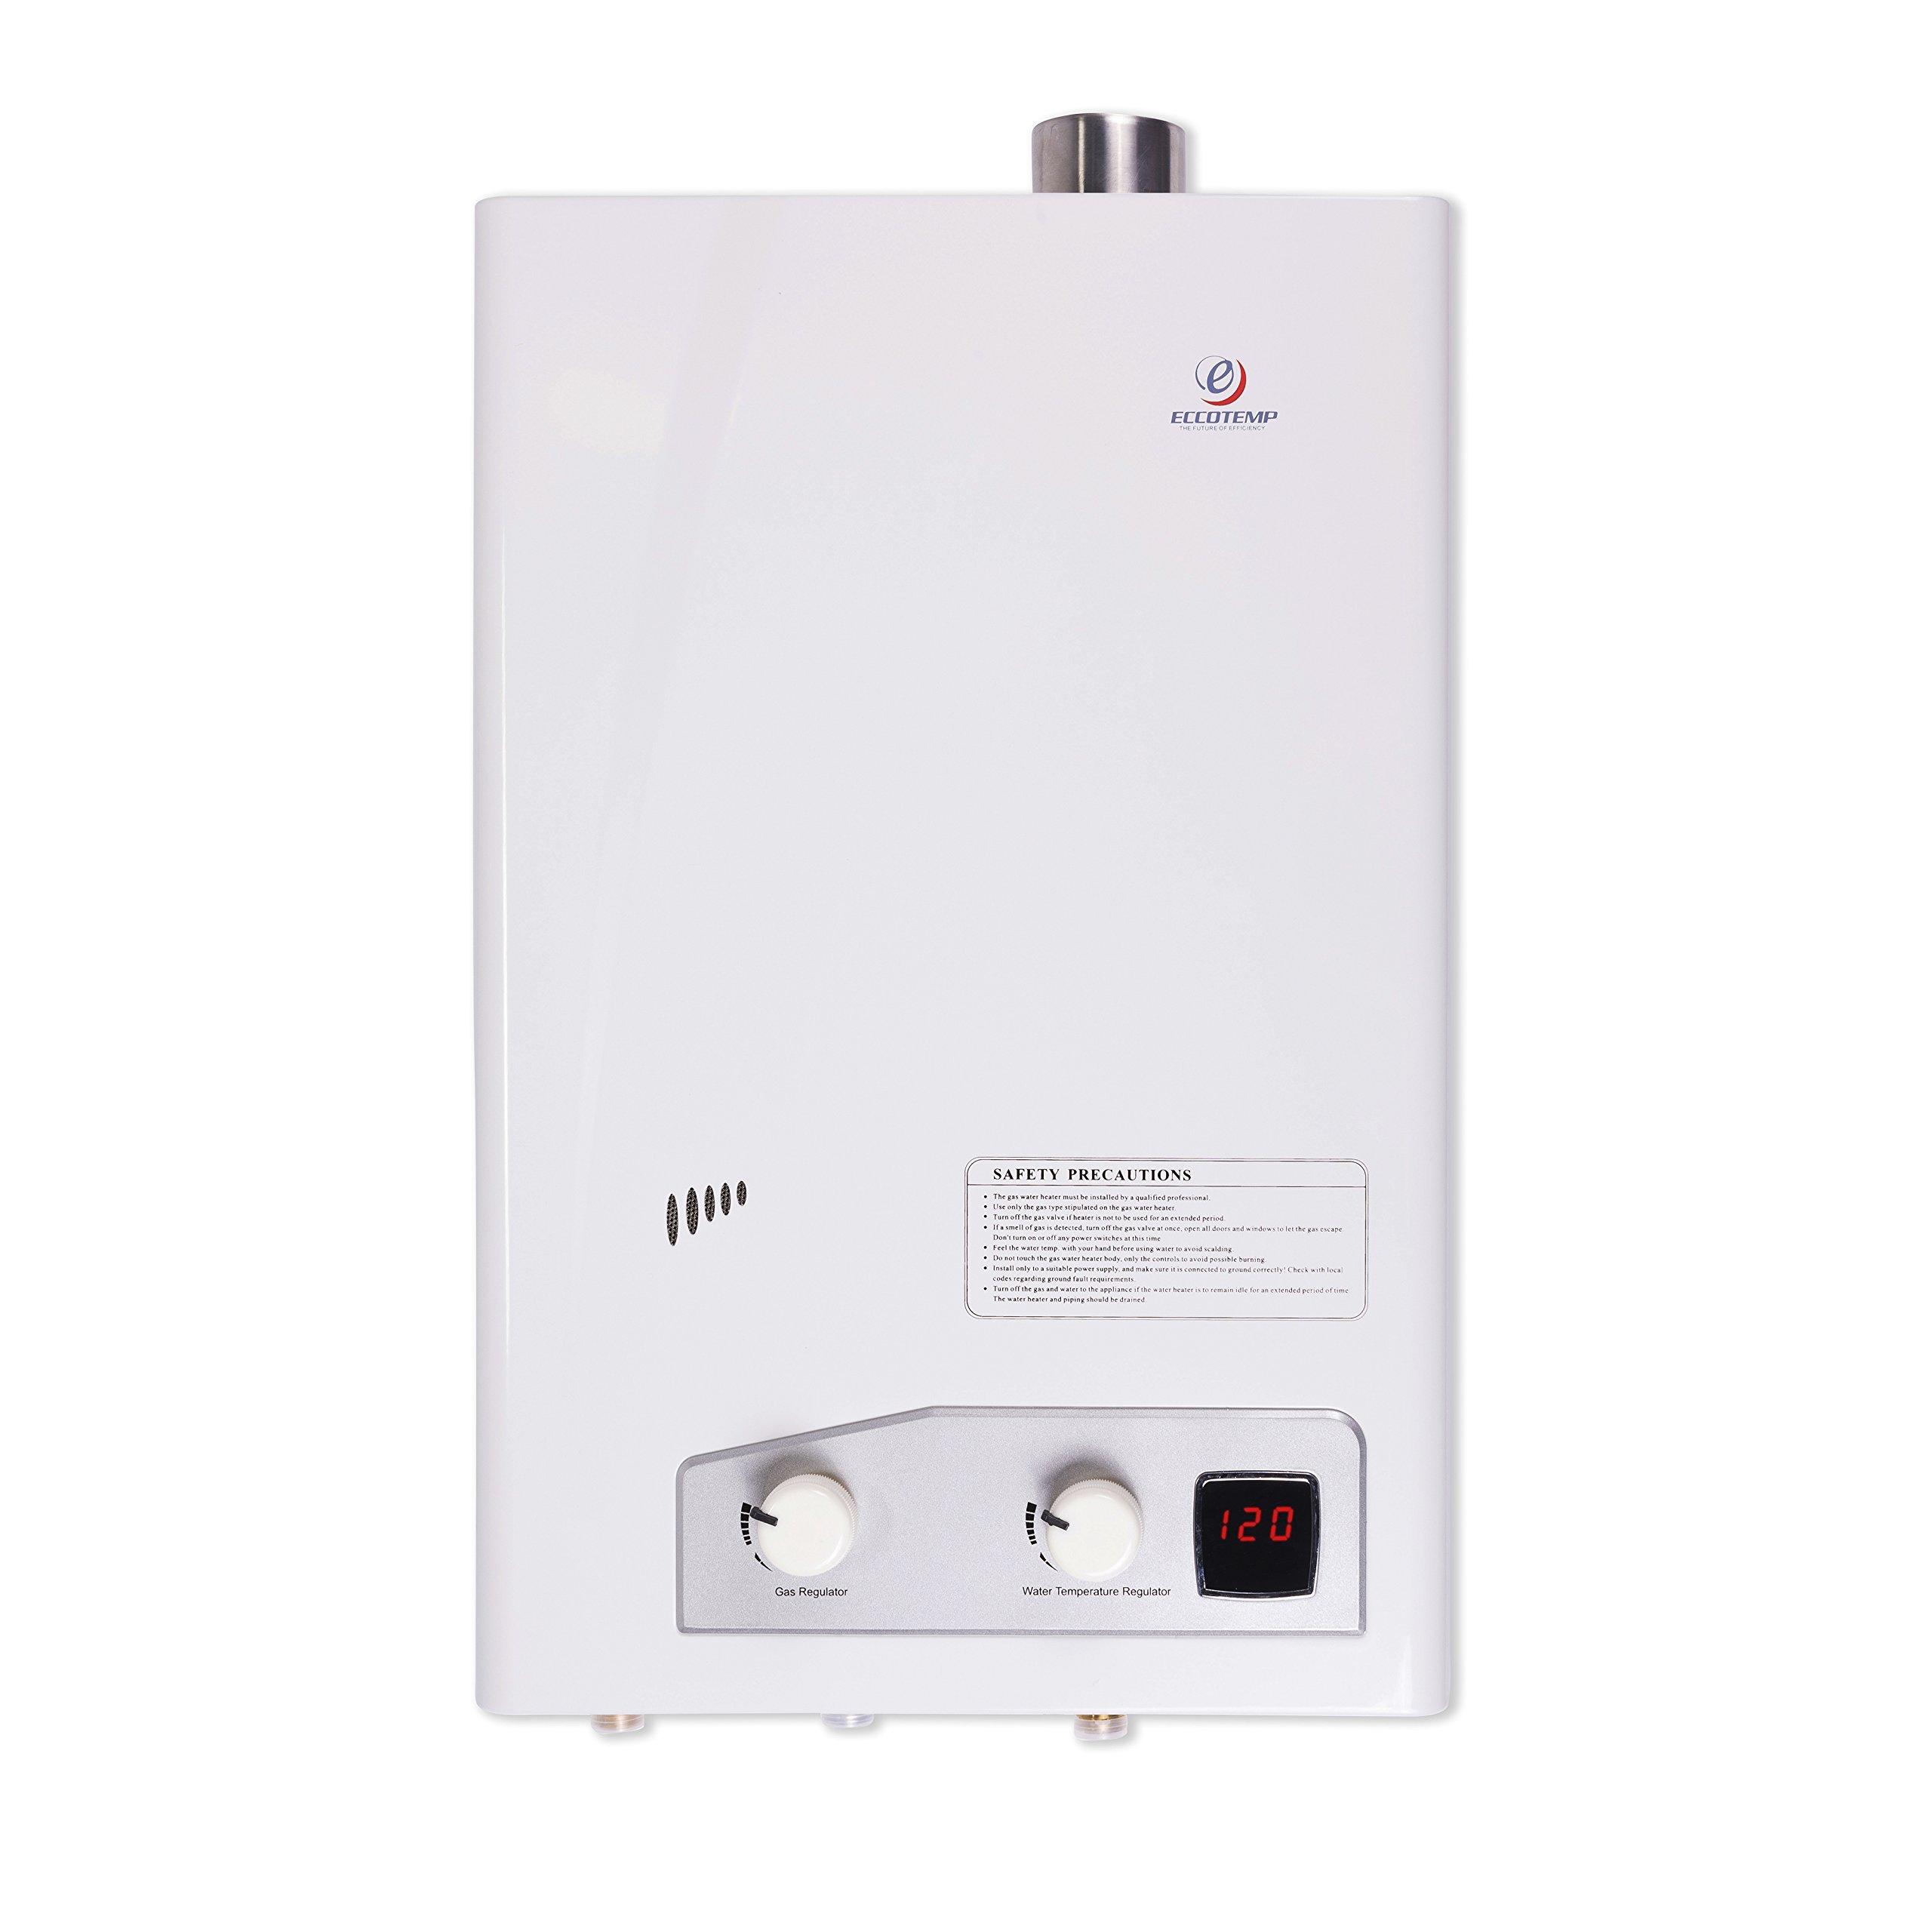 Eccotemp fvi12-NG FVI-12 Natural Gas, 3.5 GPM, High Capacity Tankless Water Heater, White by Eccotemp (Image #1)